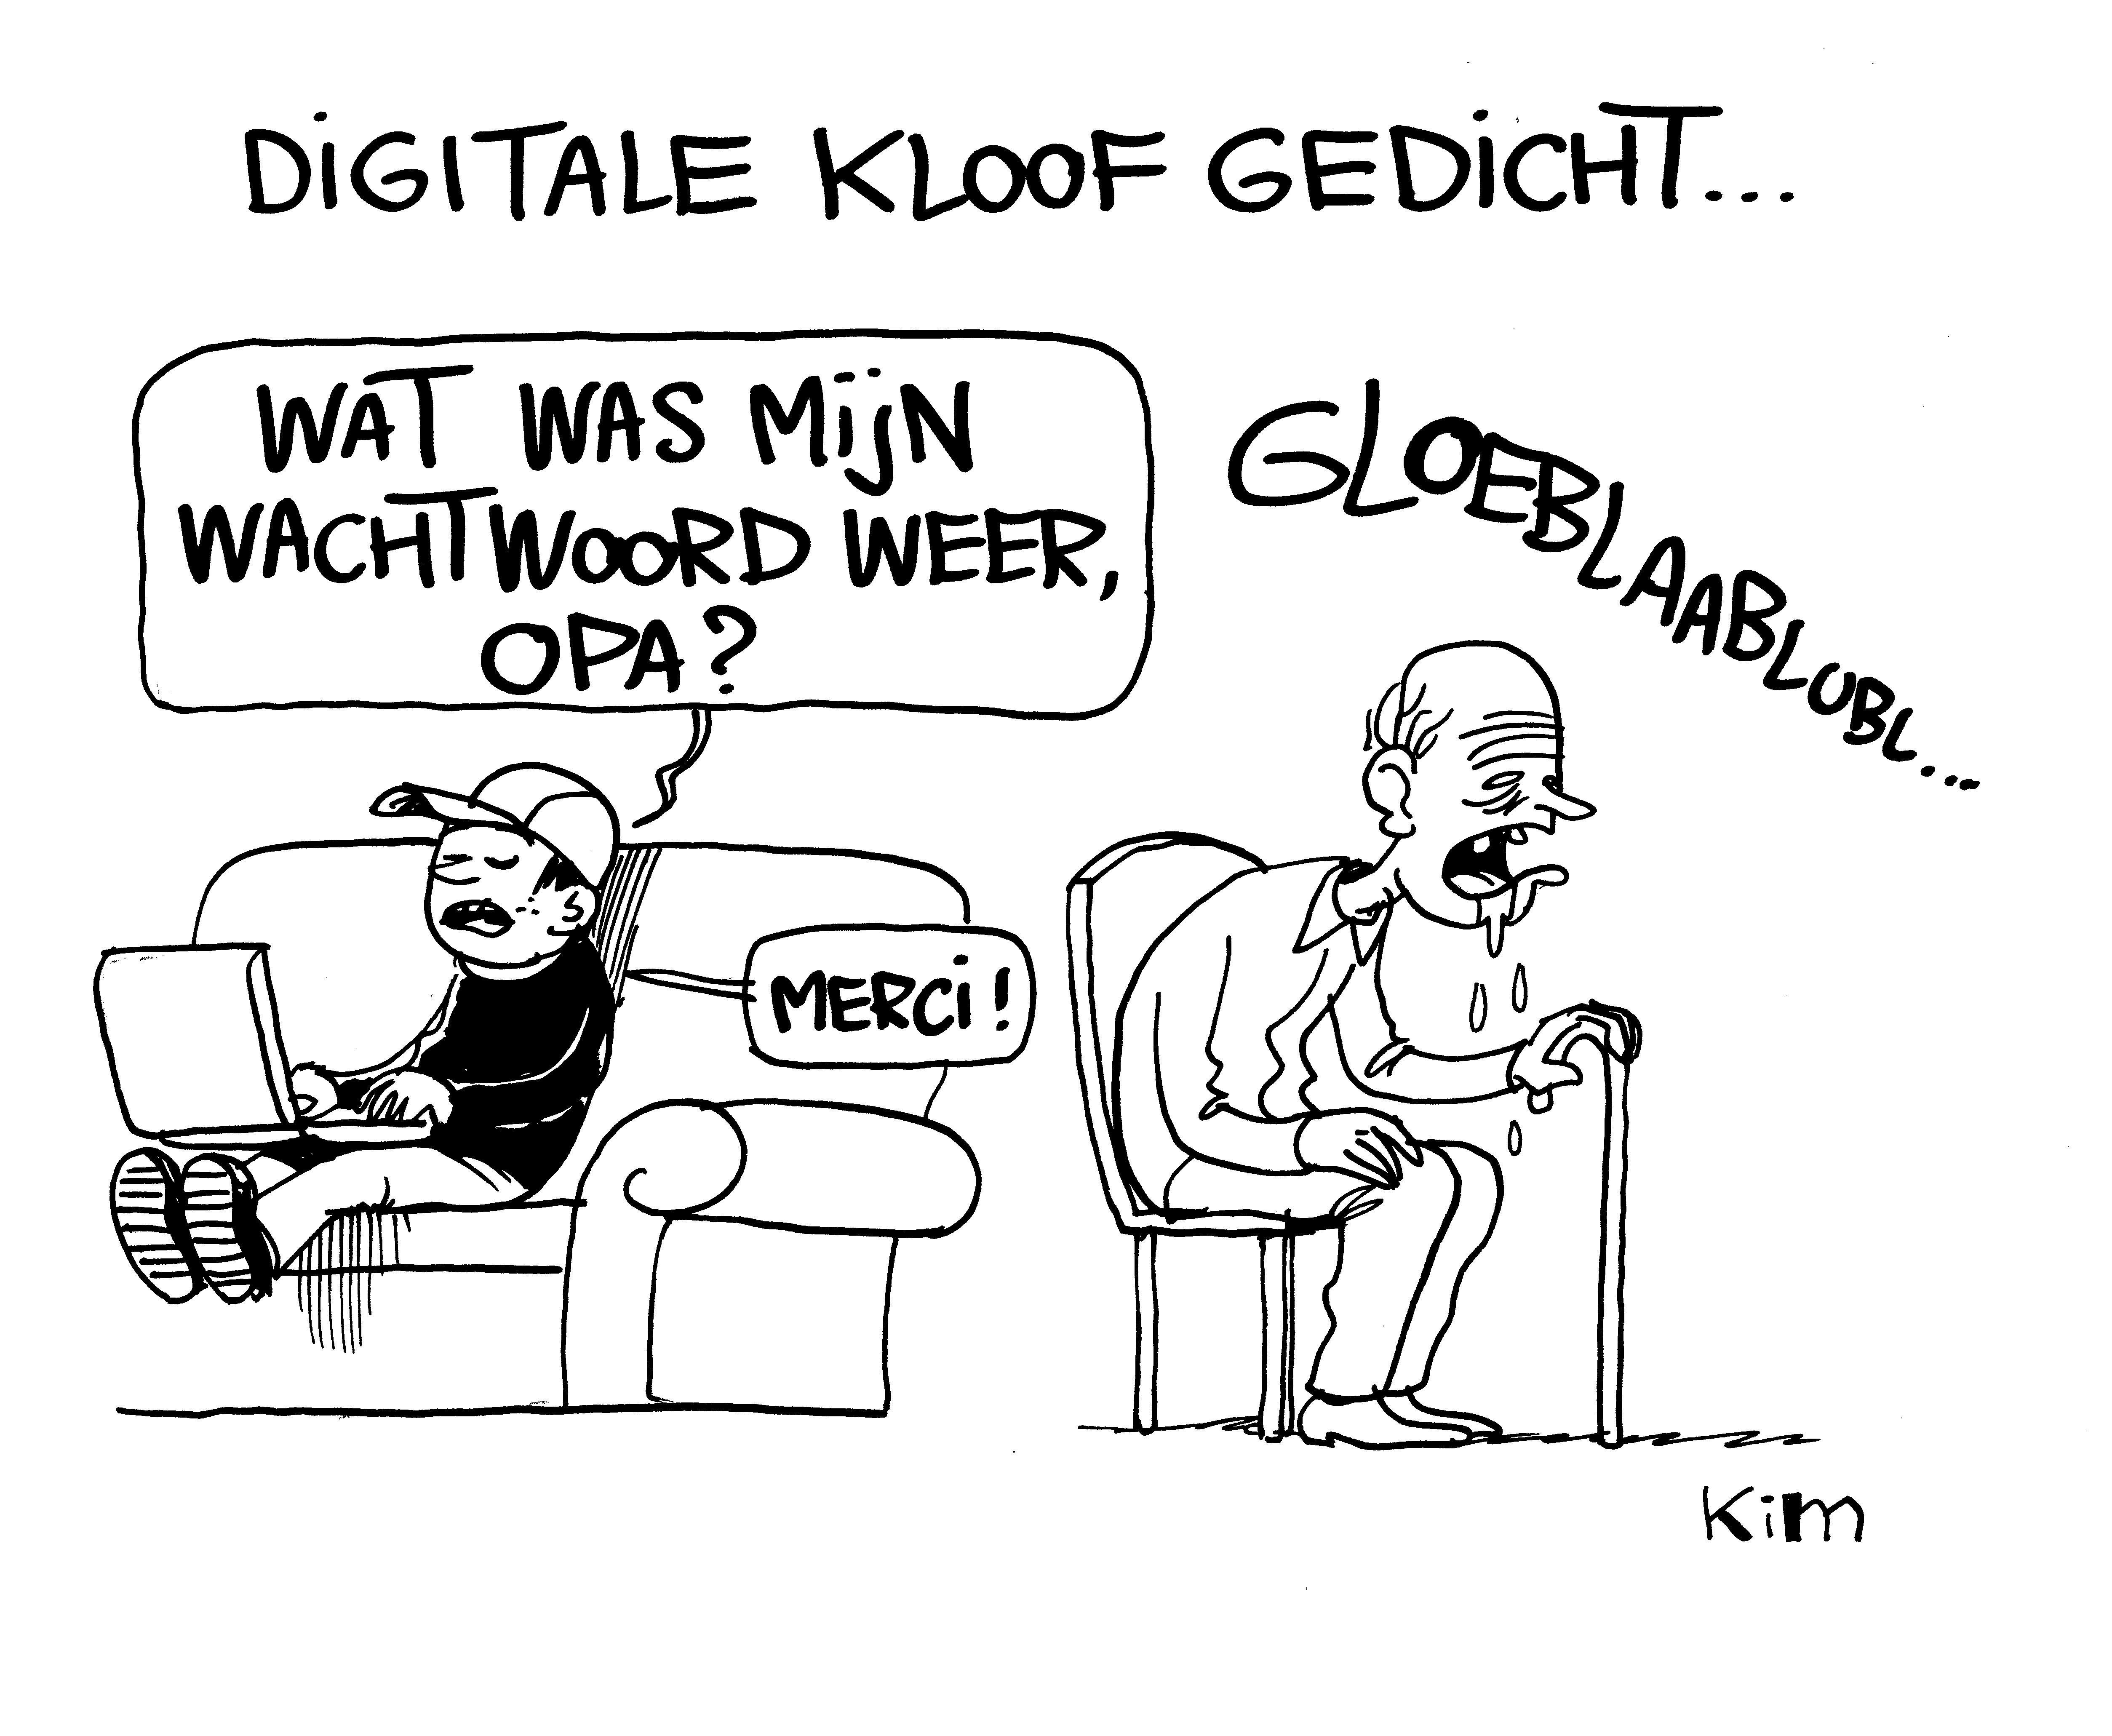 Digitale kloof gedicht...